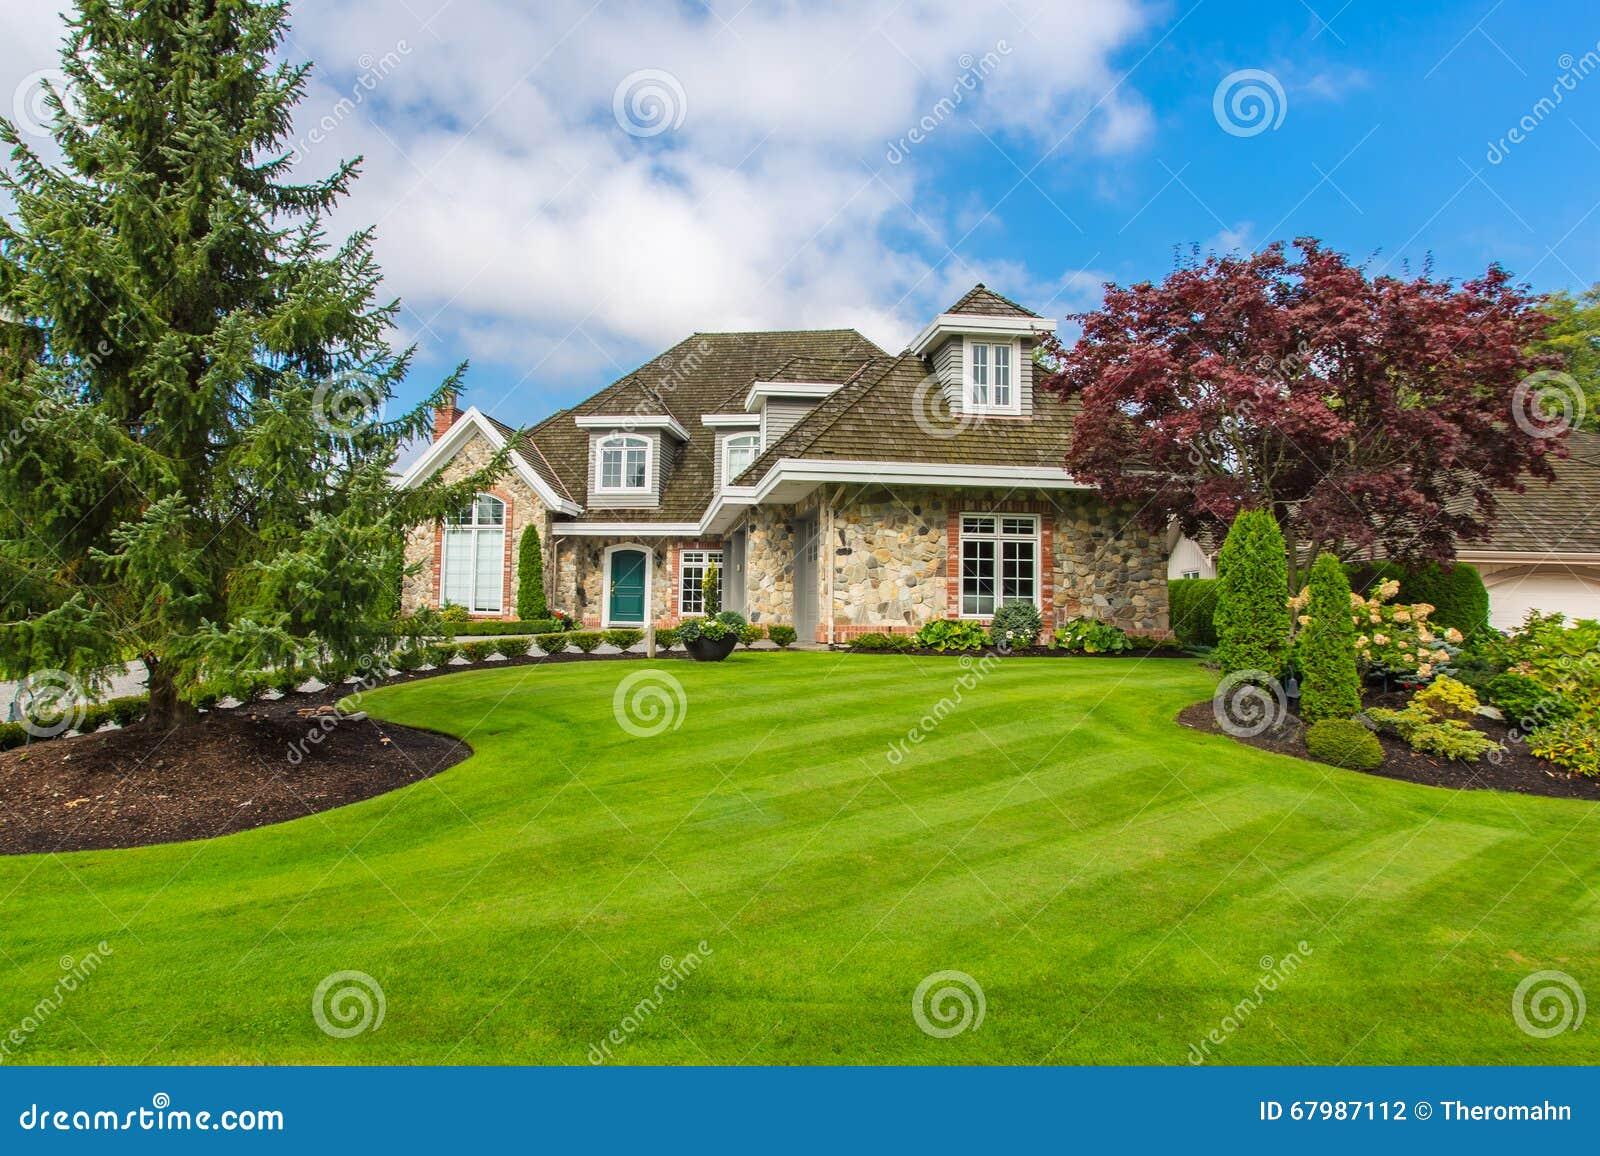 Custom Built House Stock Photo Image 67987112